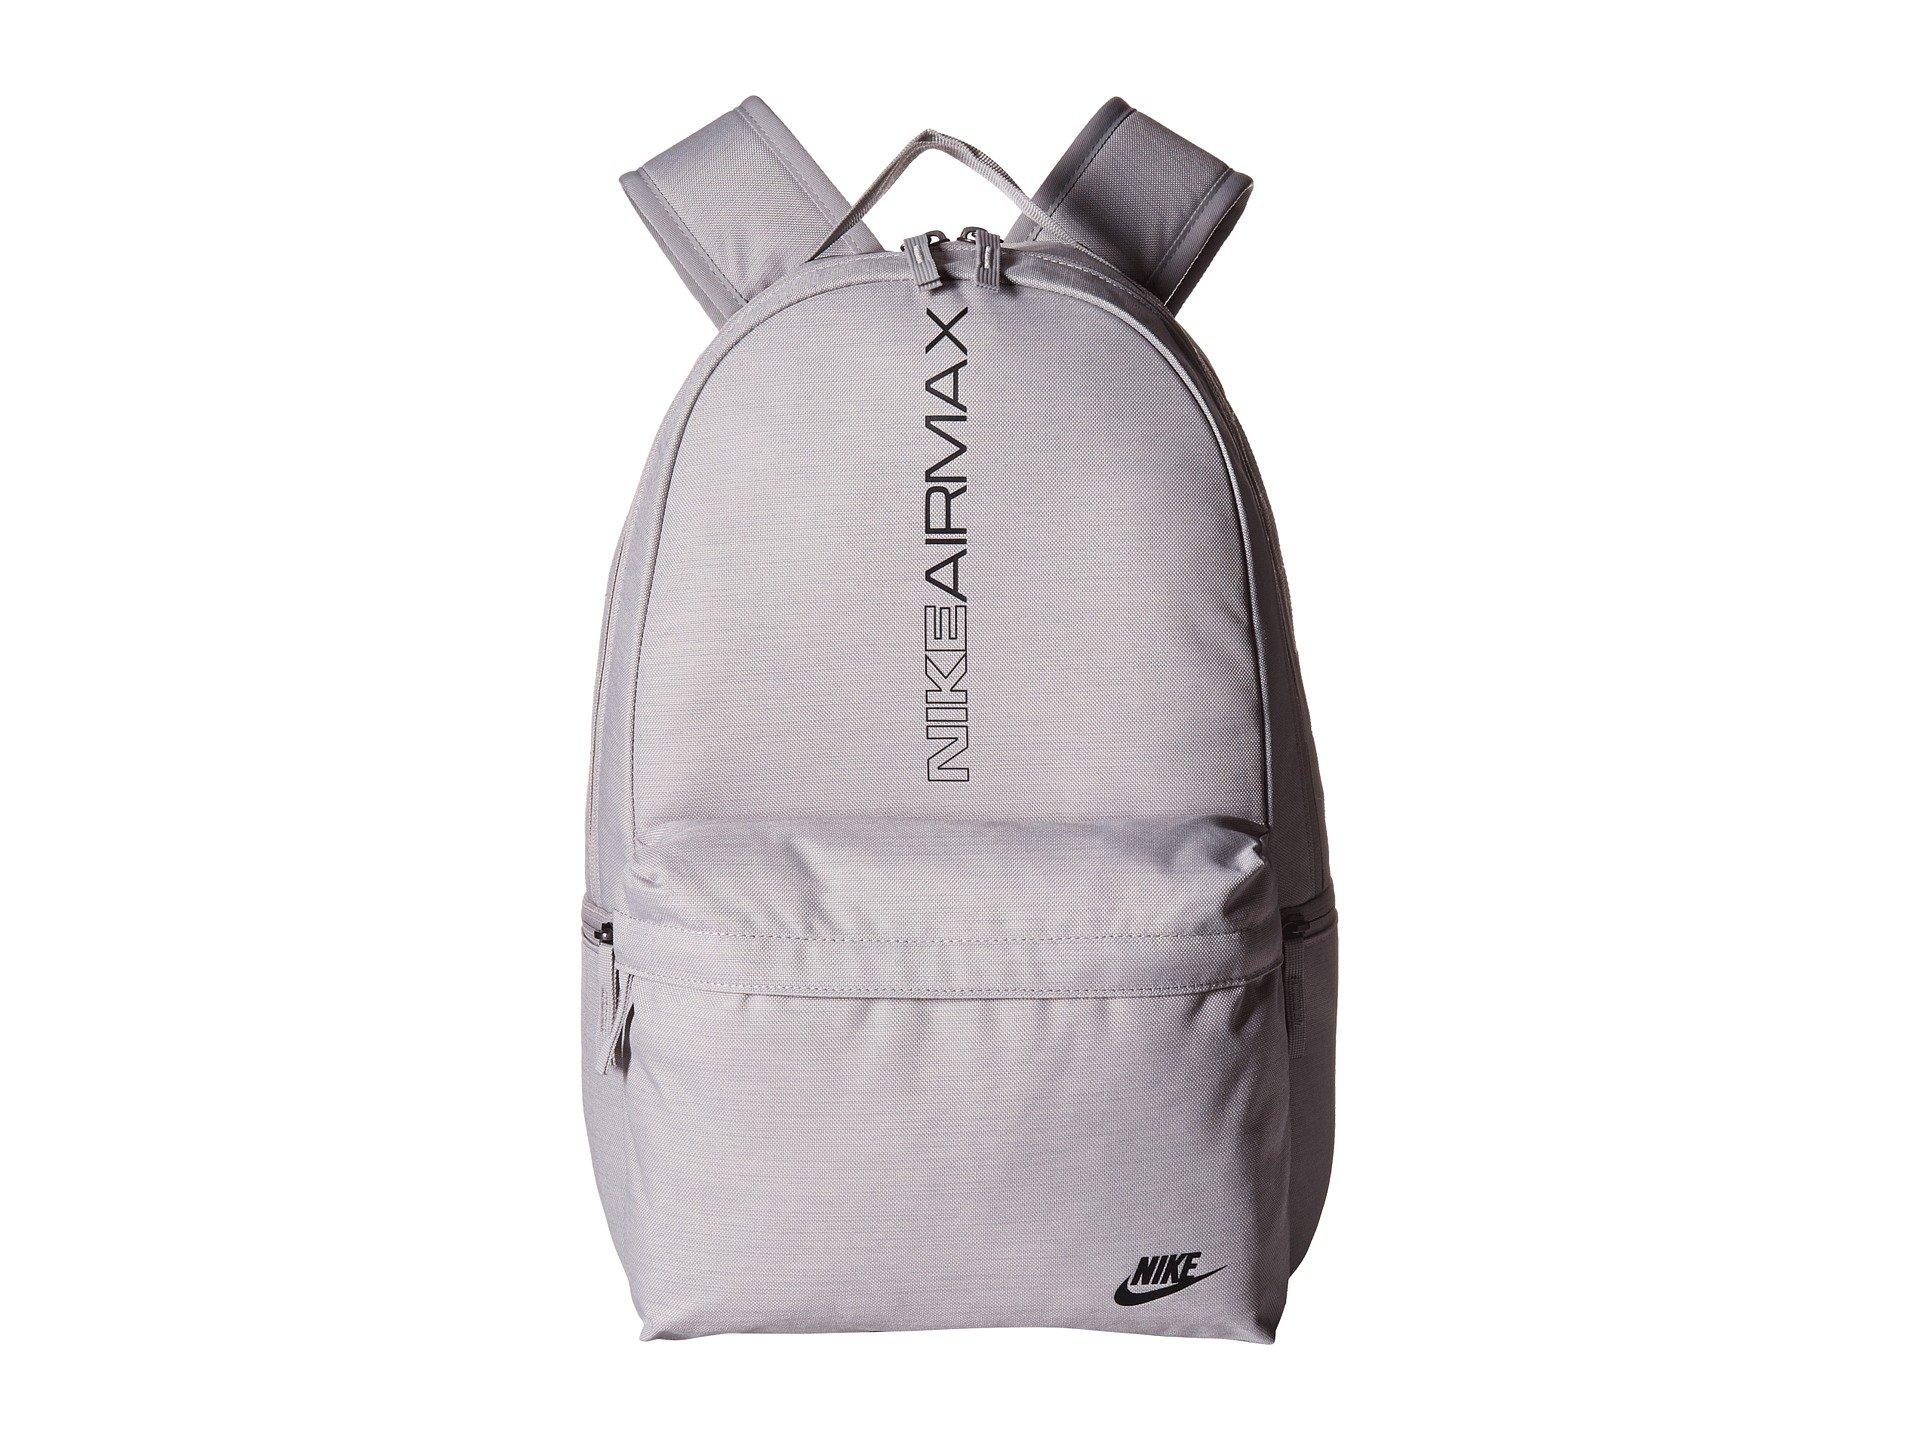 Galleon Nike Unisex Sportswear Air Max Backpack Misc